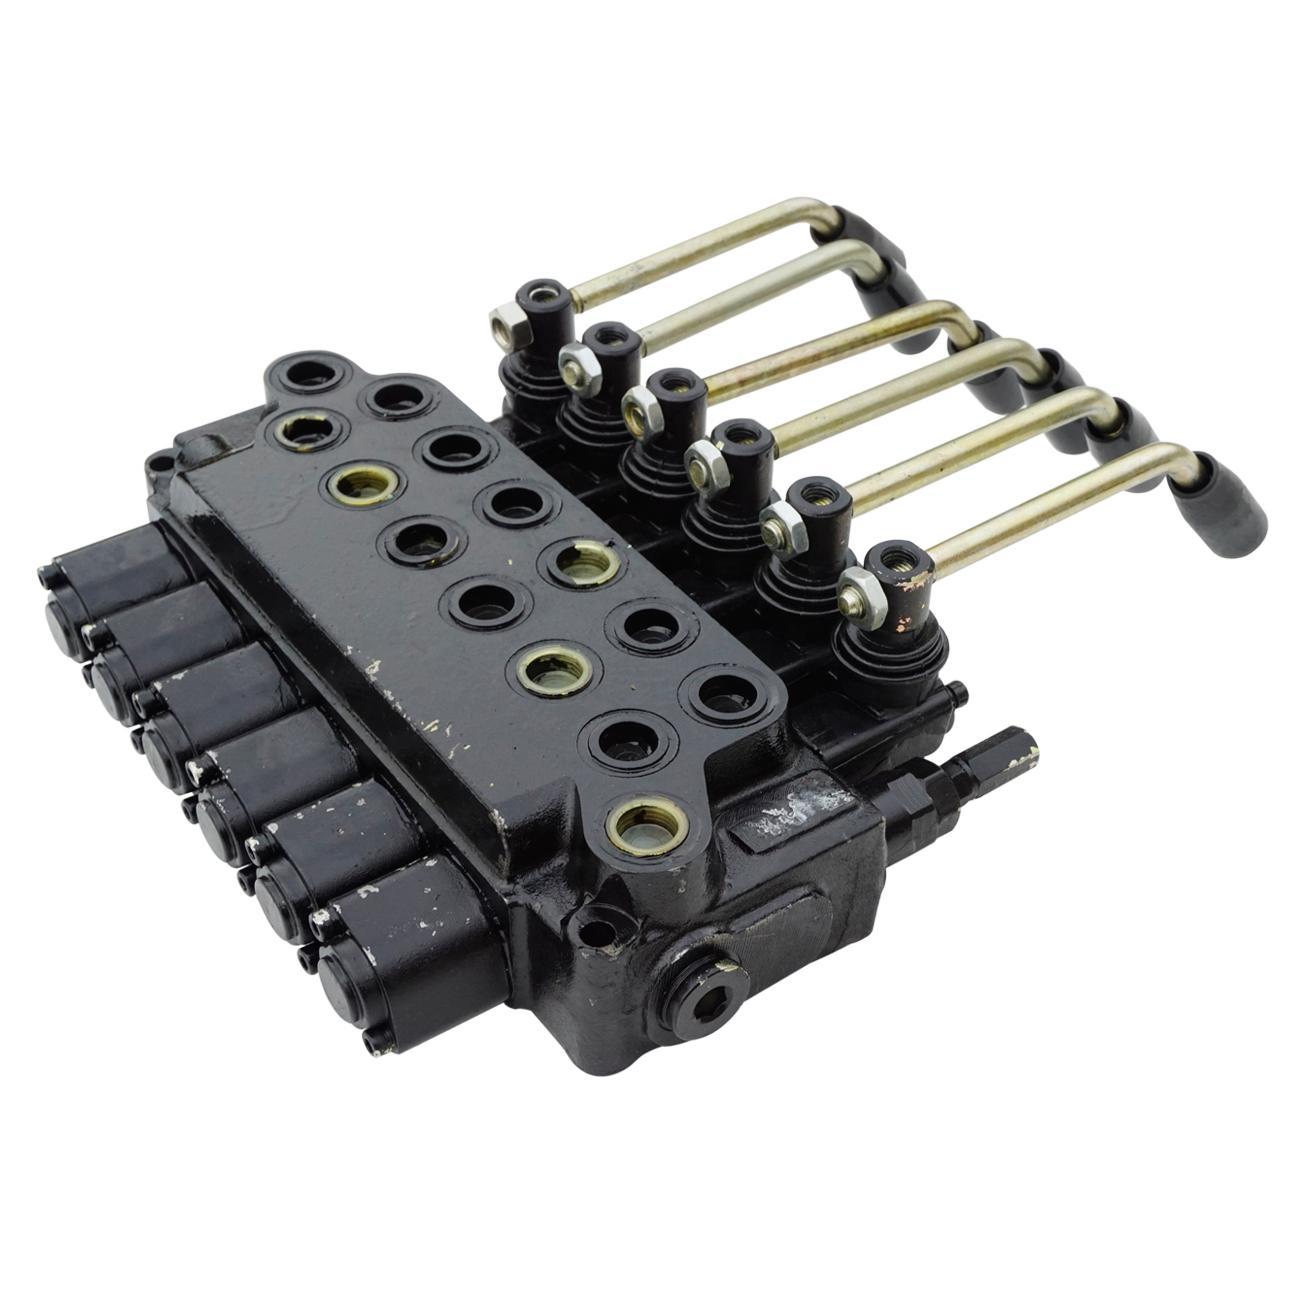 ECO Six Spool Hydraulic Valve 6 Spool Monoblock Valve 10GPM 4500PSI Max. цена